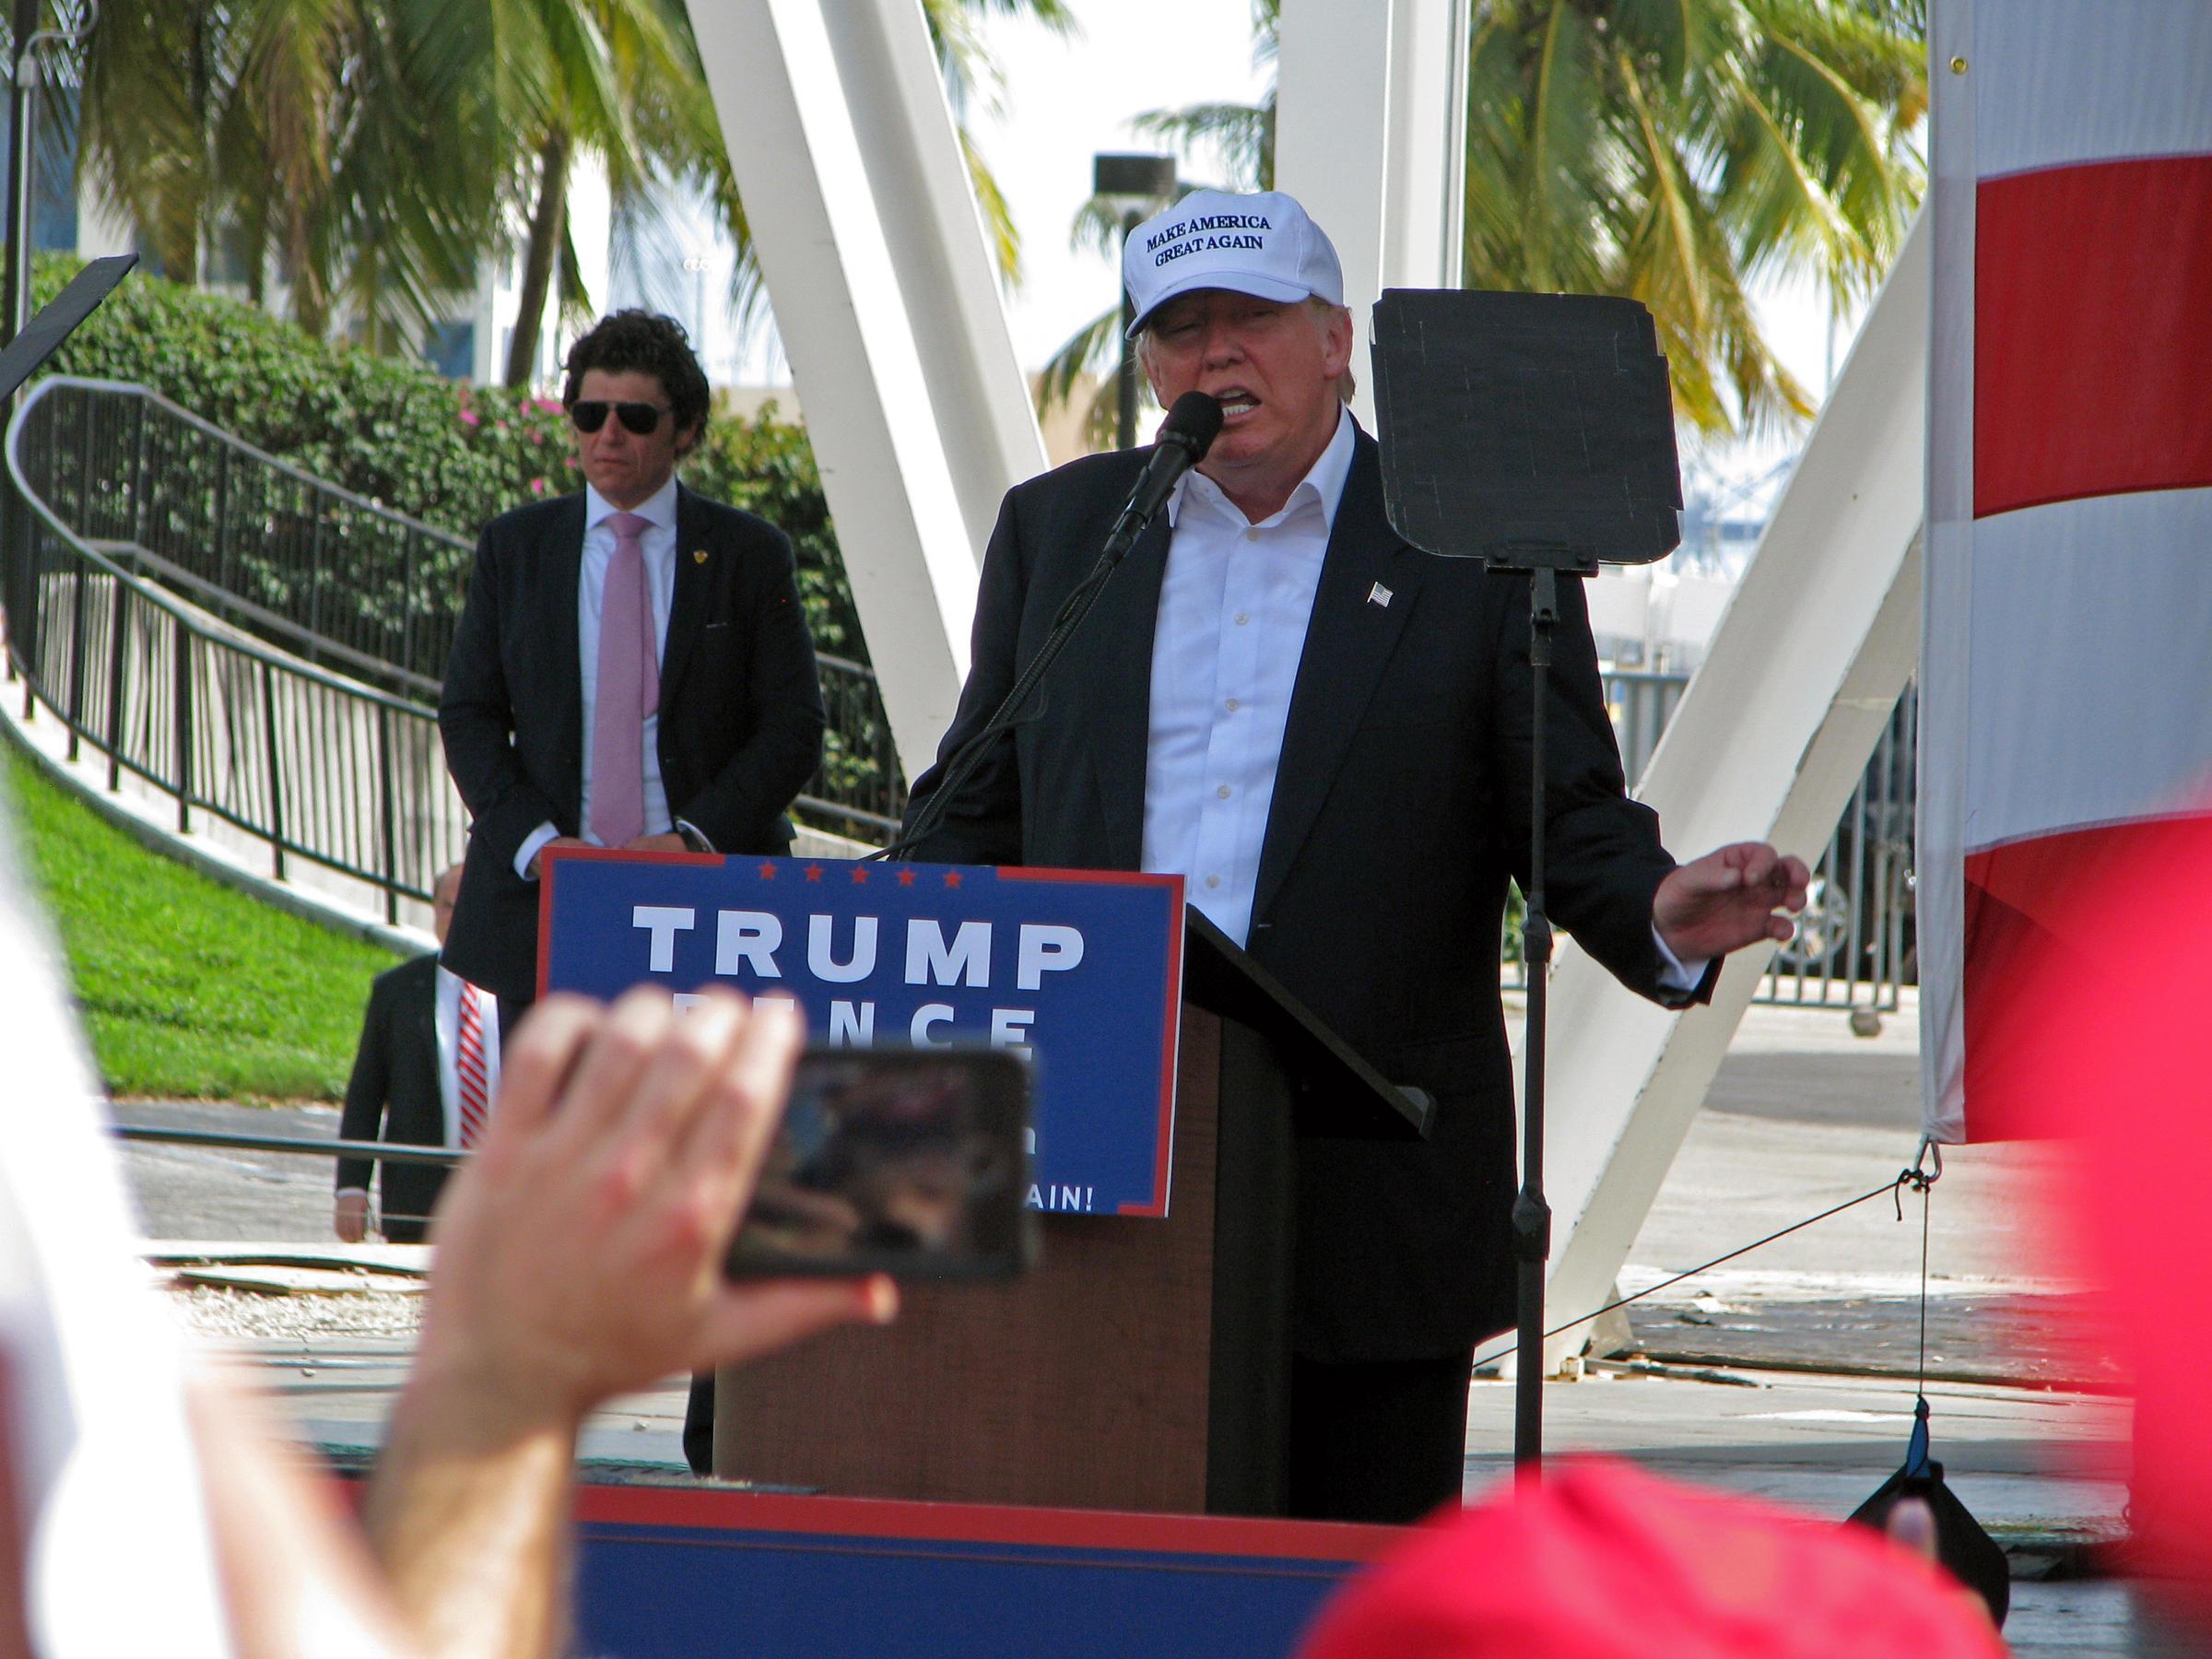 http://mediad.publicbroadcasting.net/p/wlrn/files/styles/x_large/public/201611/Trump2_kel.jpg